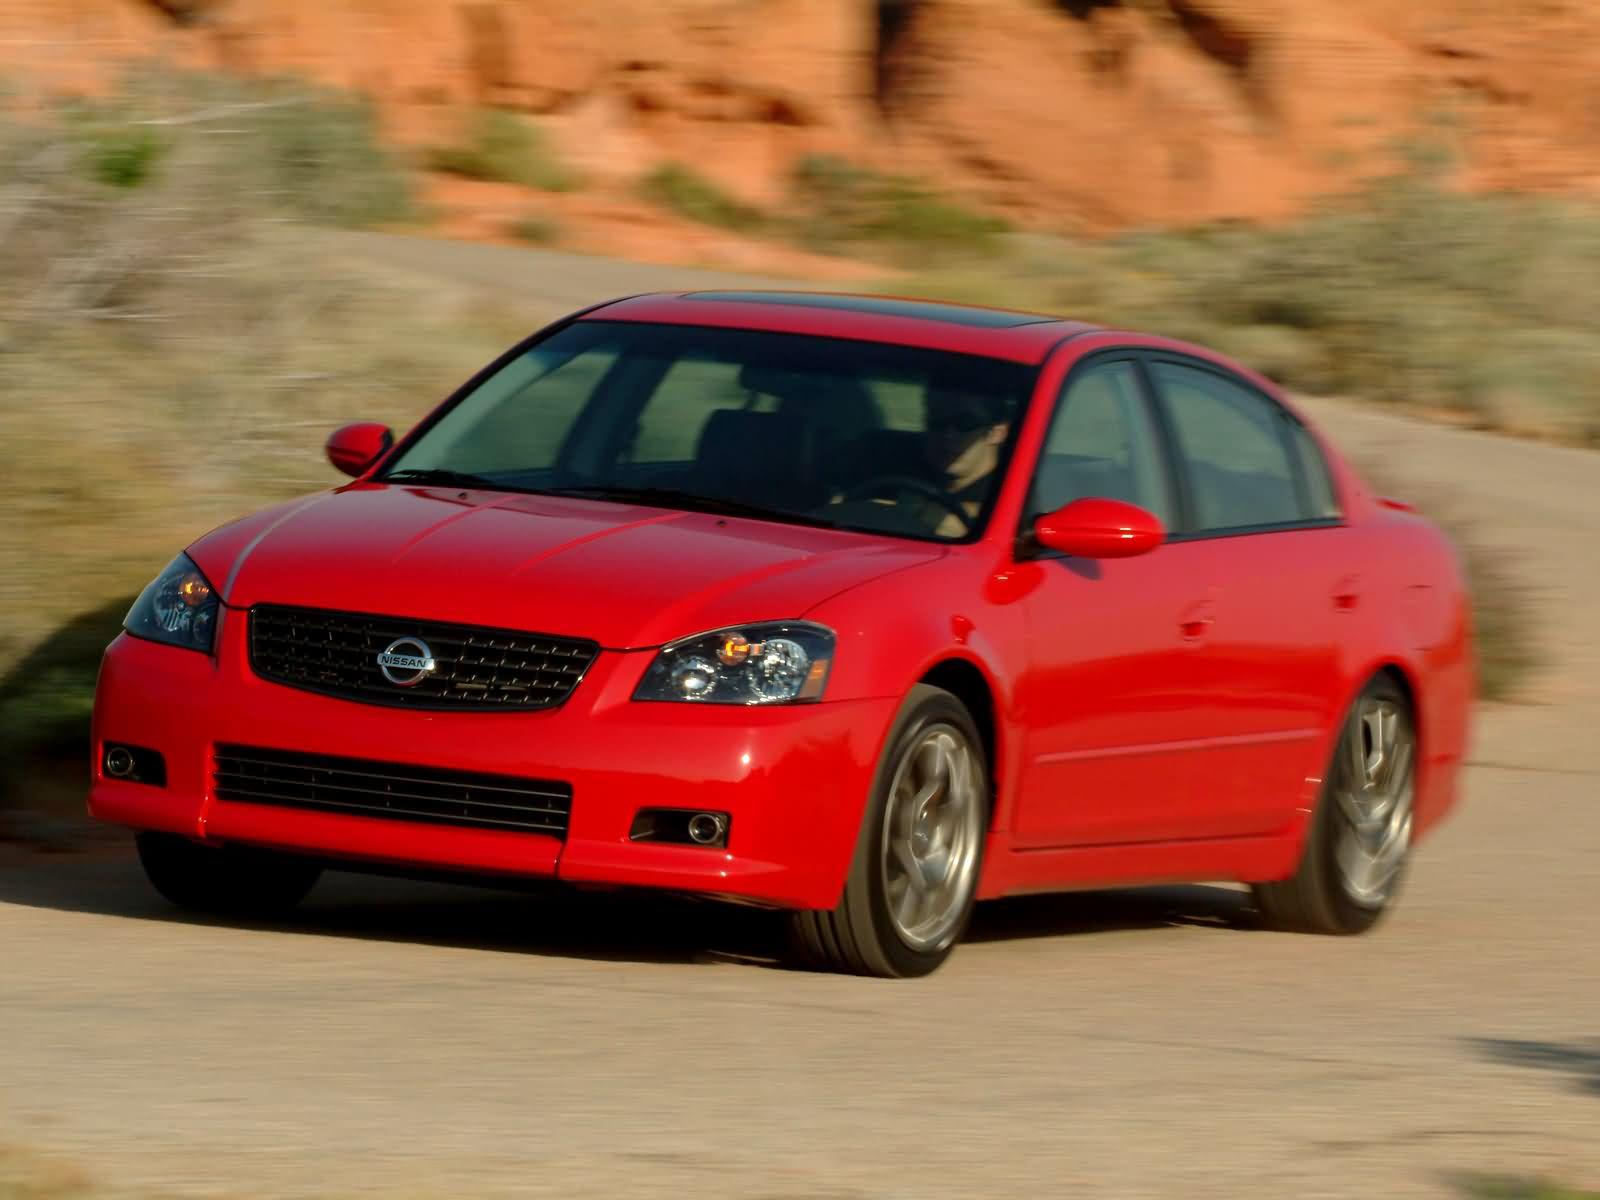 altima nissan se 2006 2002 2005 2004 2003 cars autoevolution specs 1600 1024 5l 1200